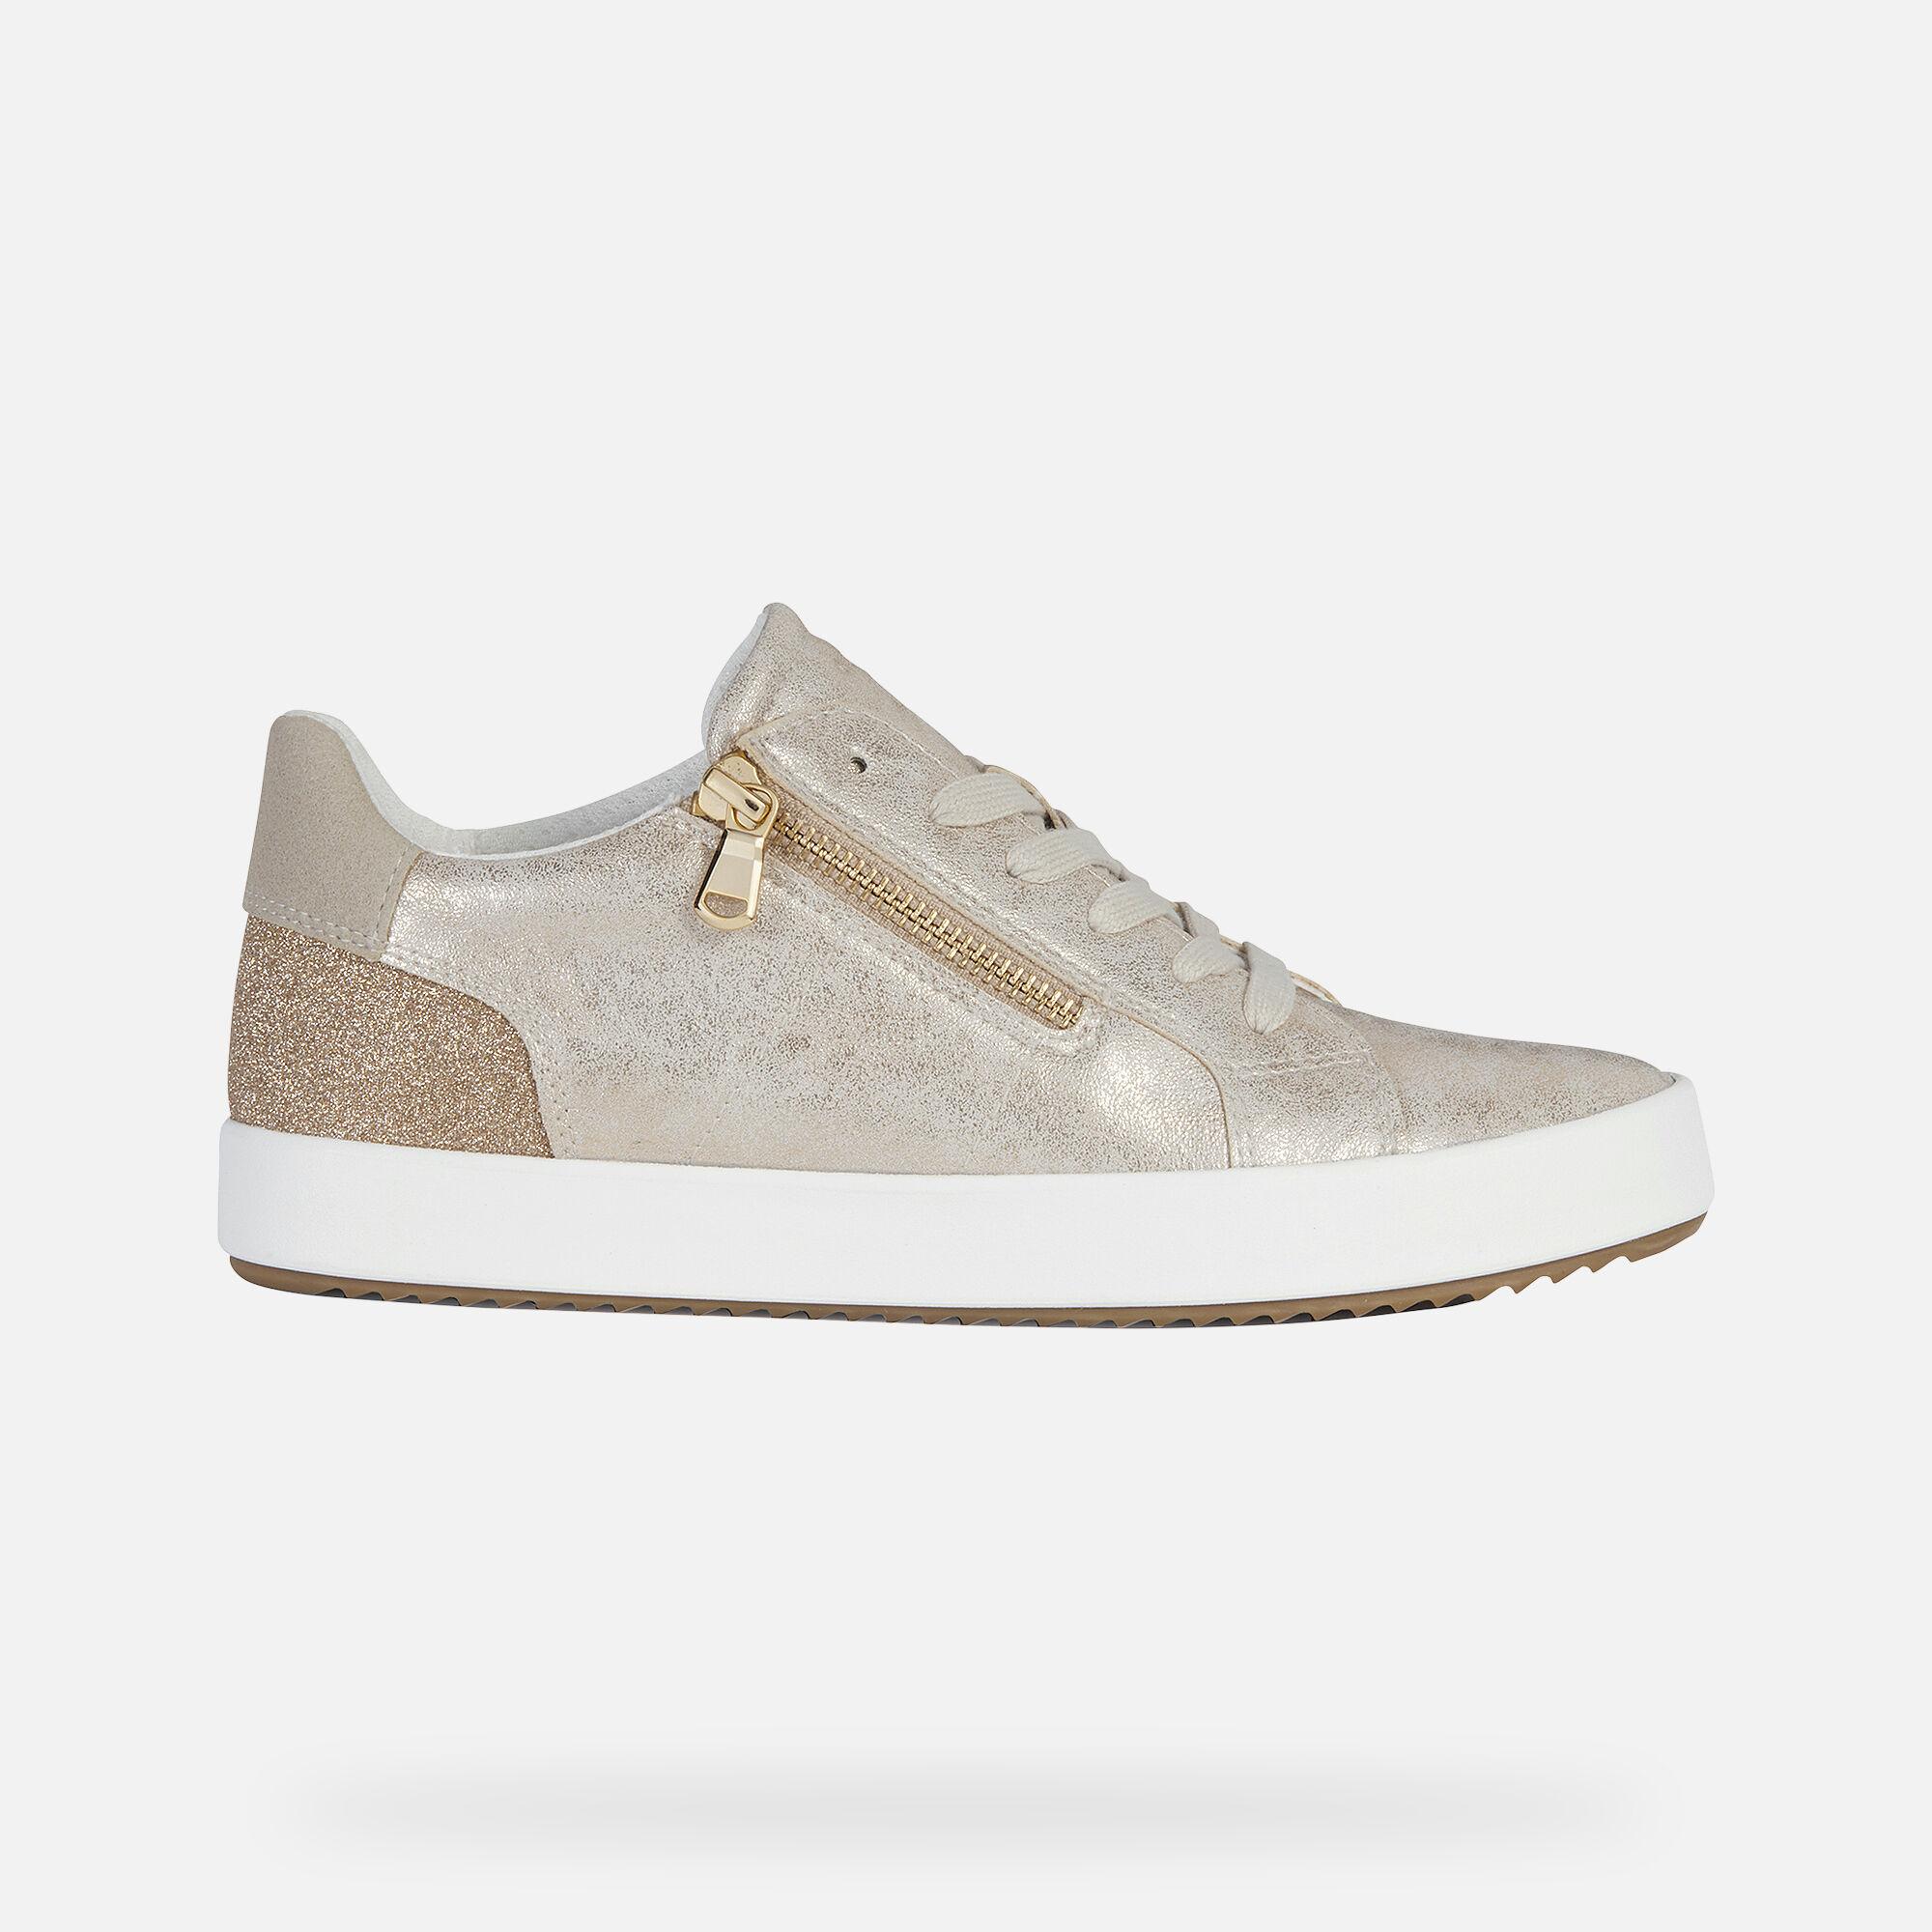 Geox BLOMIEE DAME: Hellgold Sneakers | Geox ® SS 20